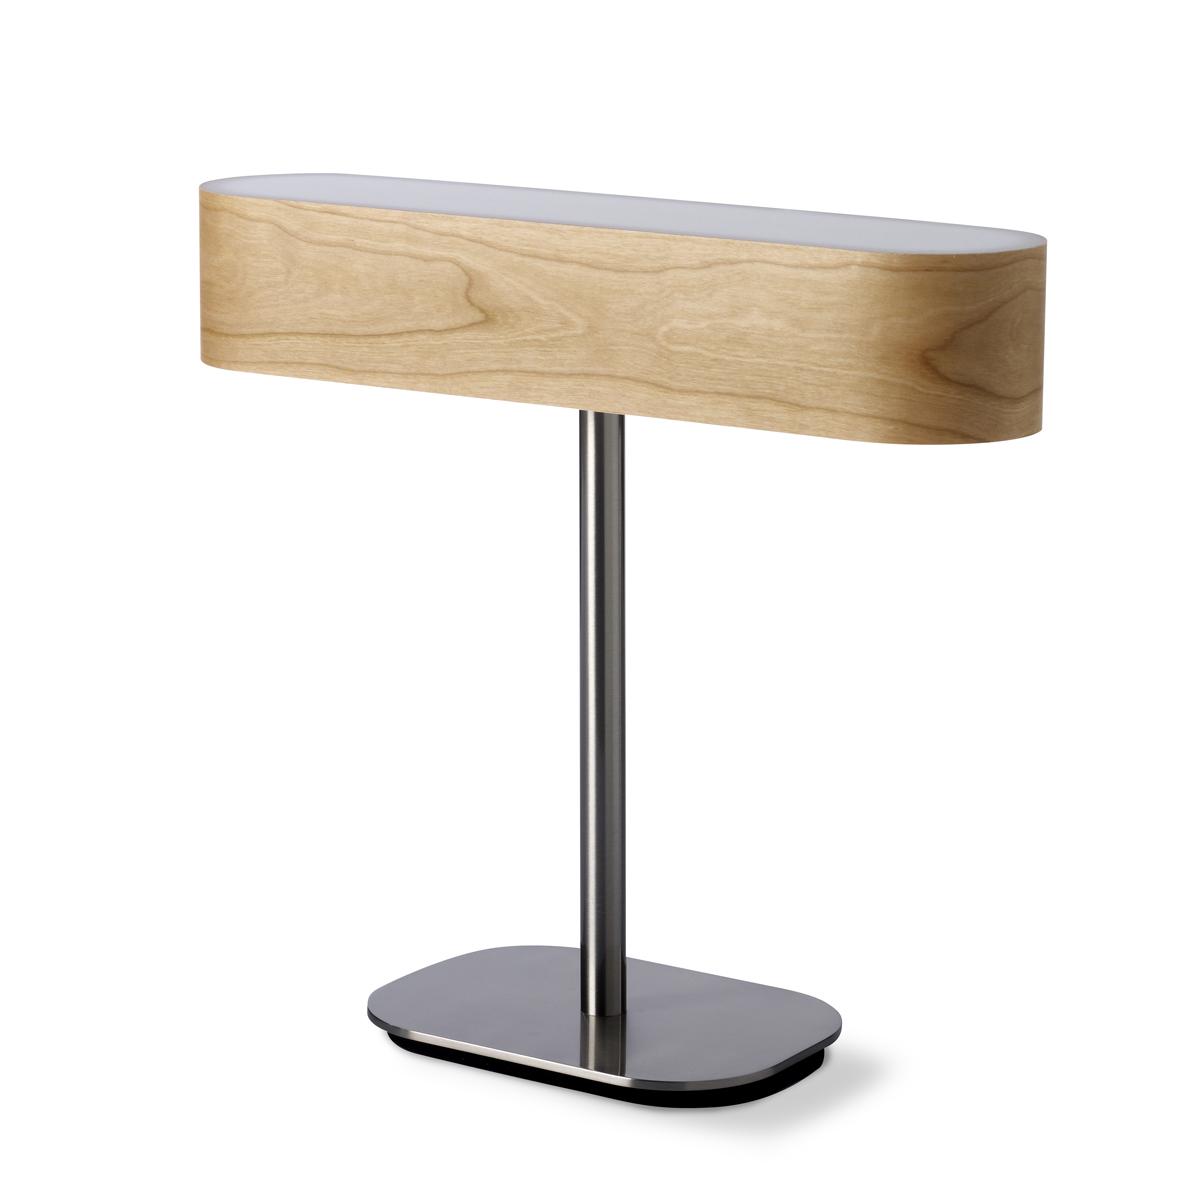 LZF Lamps I-Club LED Tischleuchte I M LED DIM 21